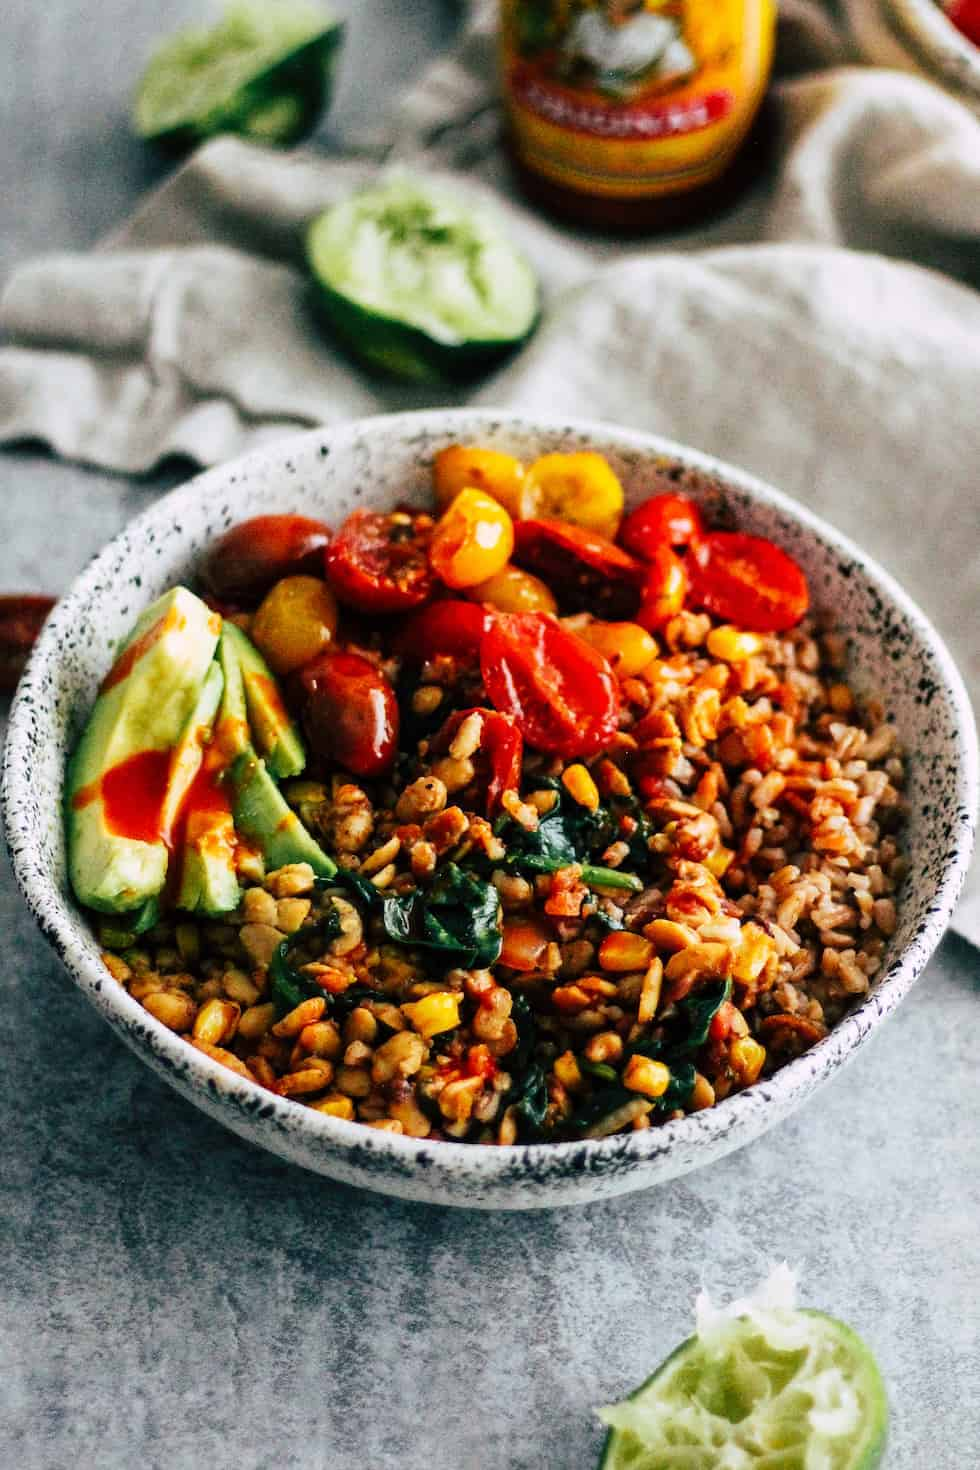 Vegetarian Tempeh Burrito Bowls in a ceramic bowl with linen napkin.